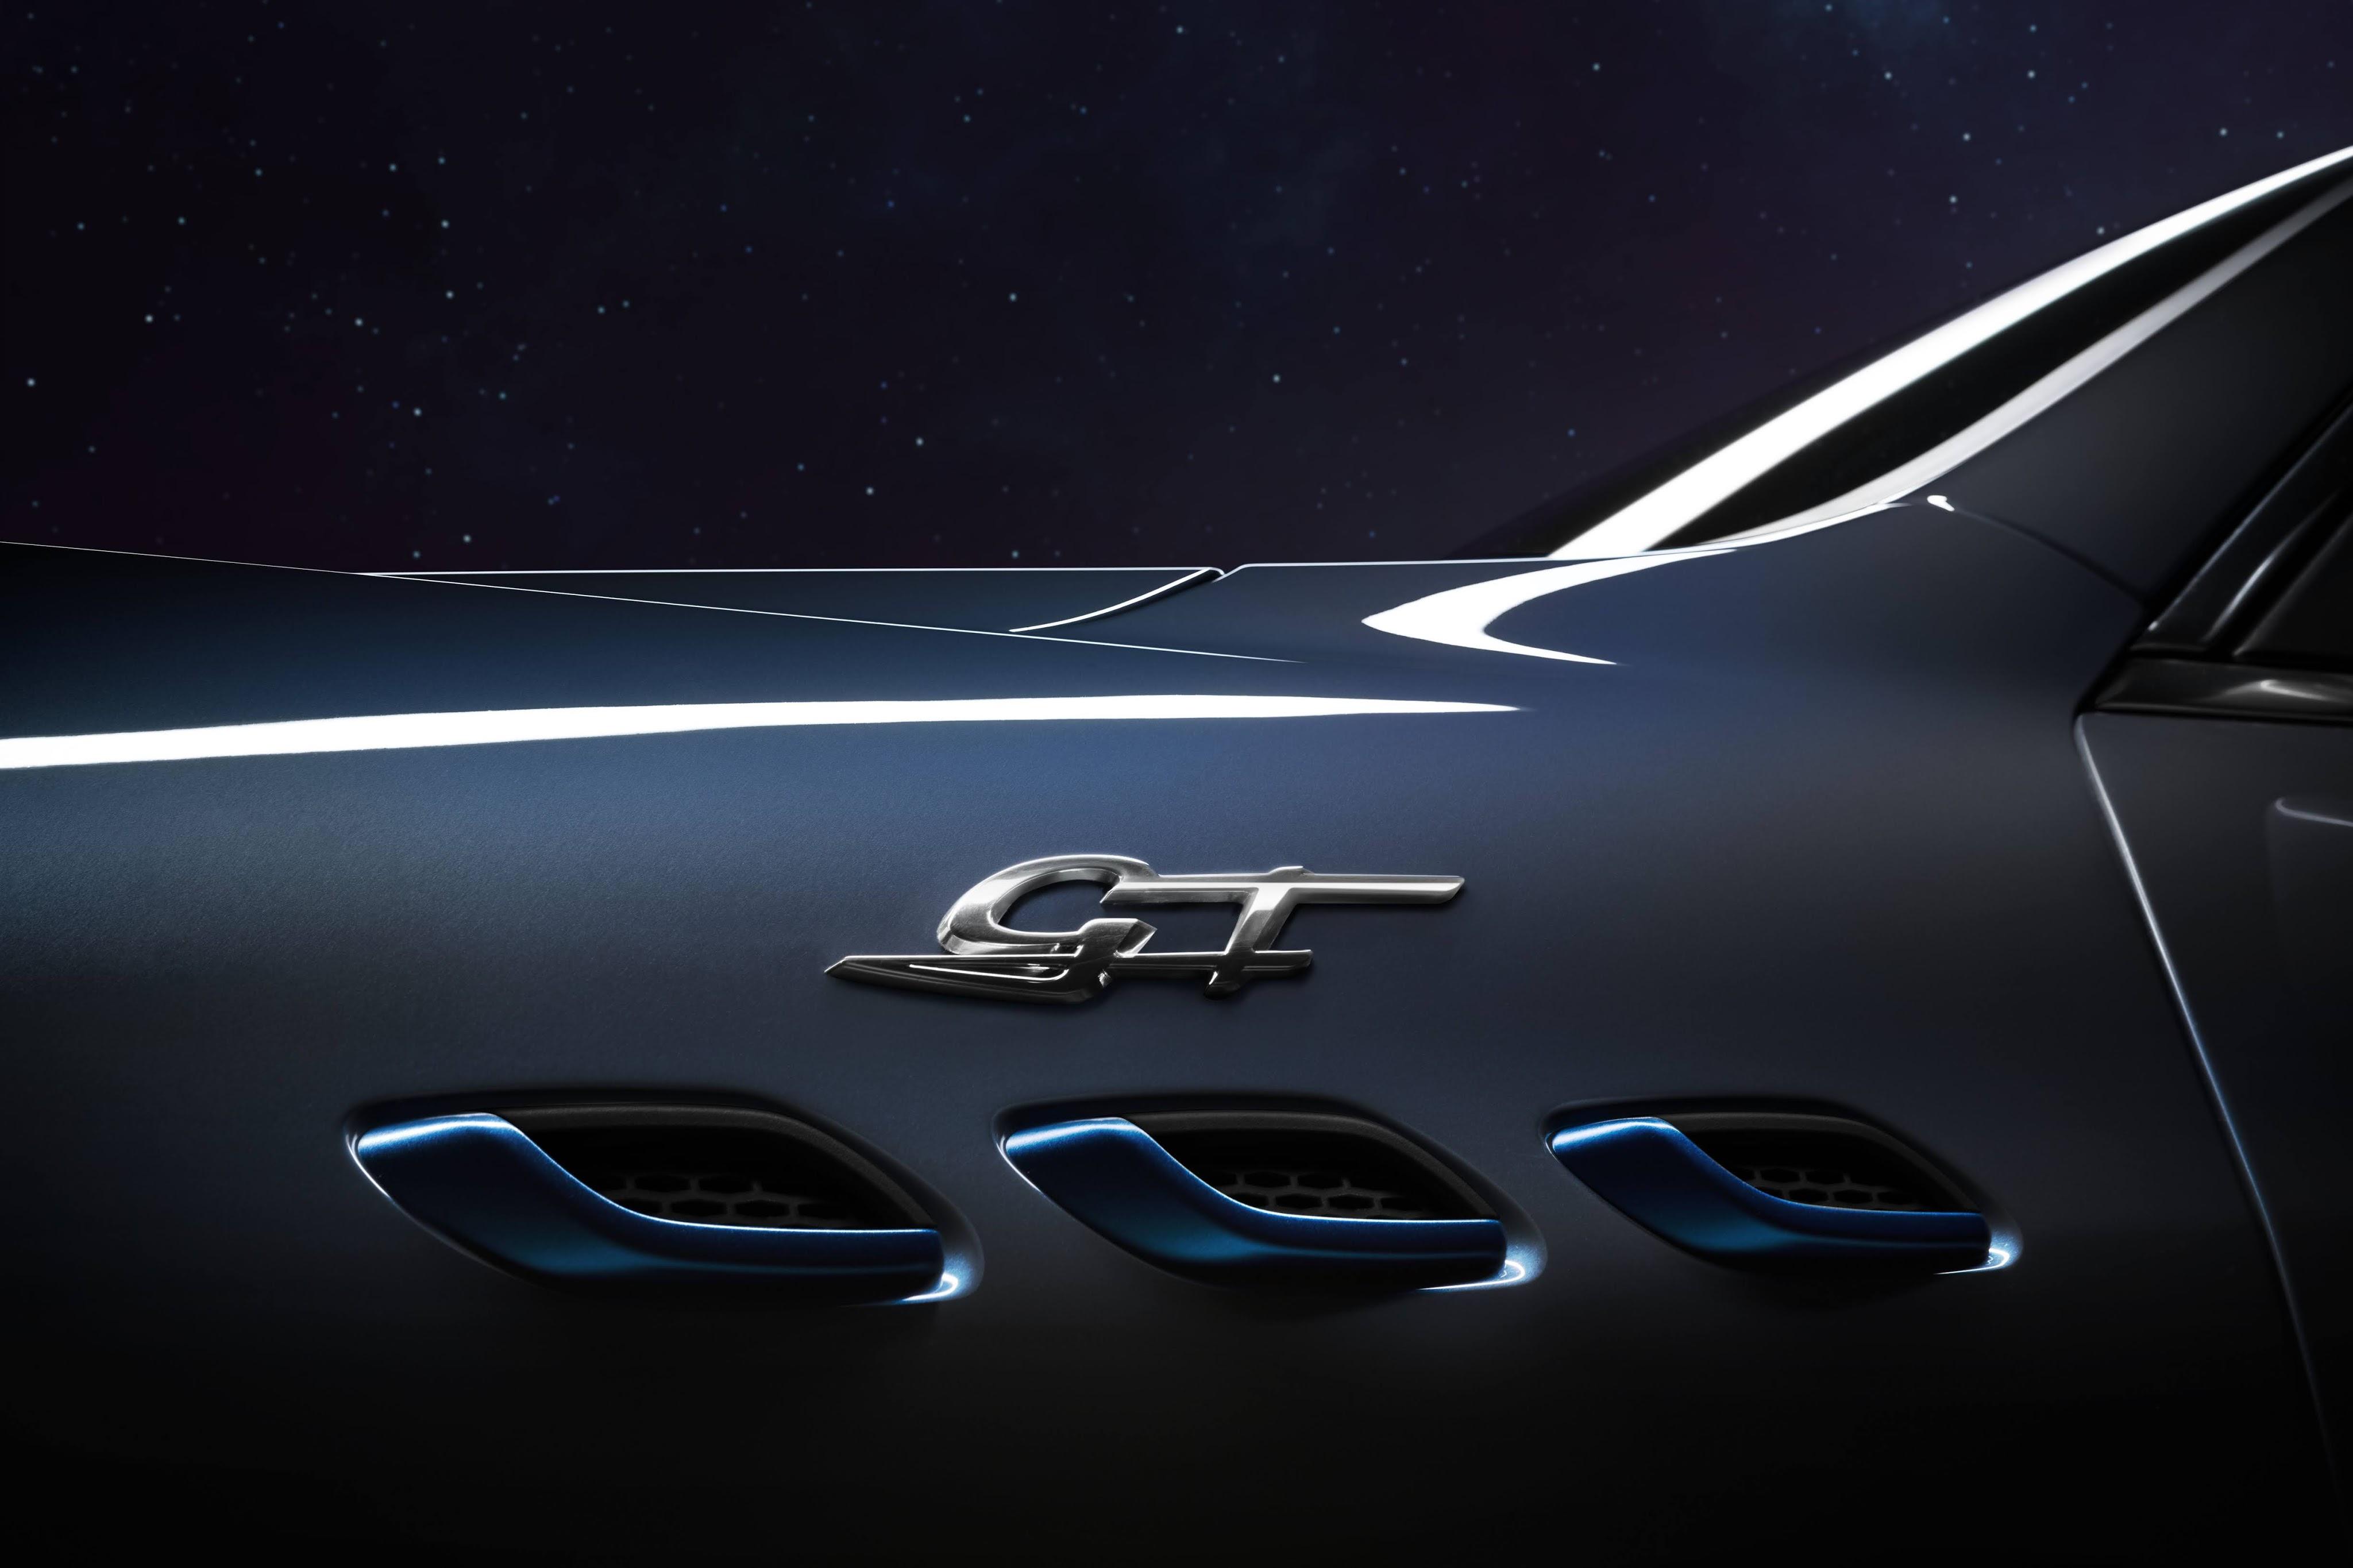 Maserati Levante Hybrid - (c) Maserati Media